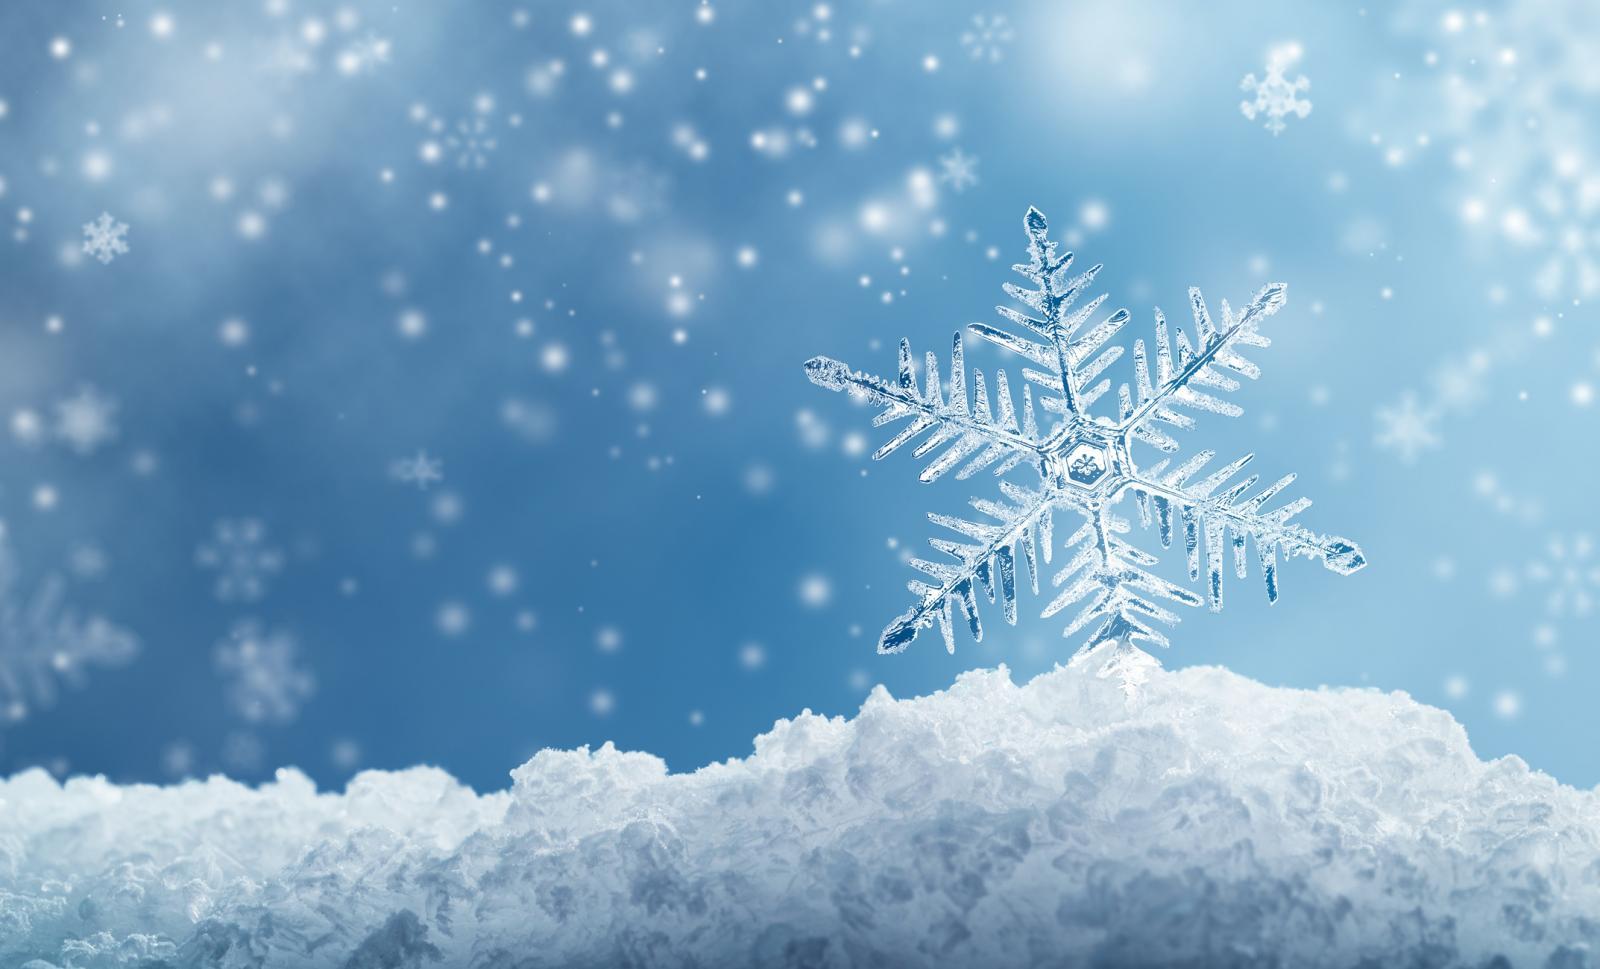 Real Snowflakes Falling Wallpaper 2018 Musical Frozen Broadway Em Nova York Imgressos Em